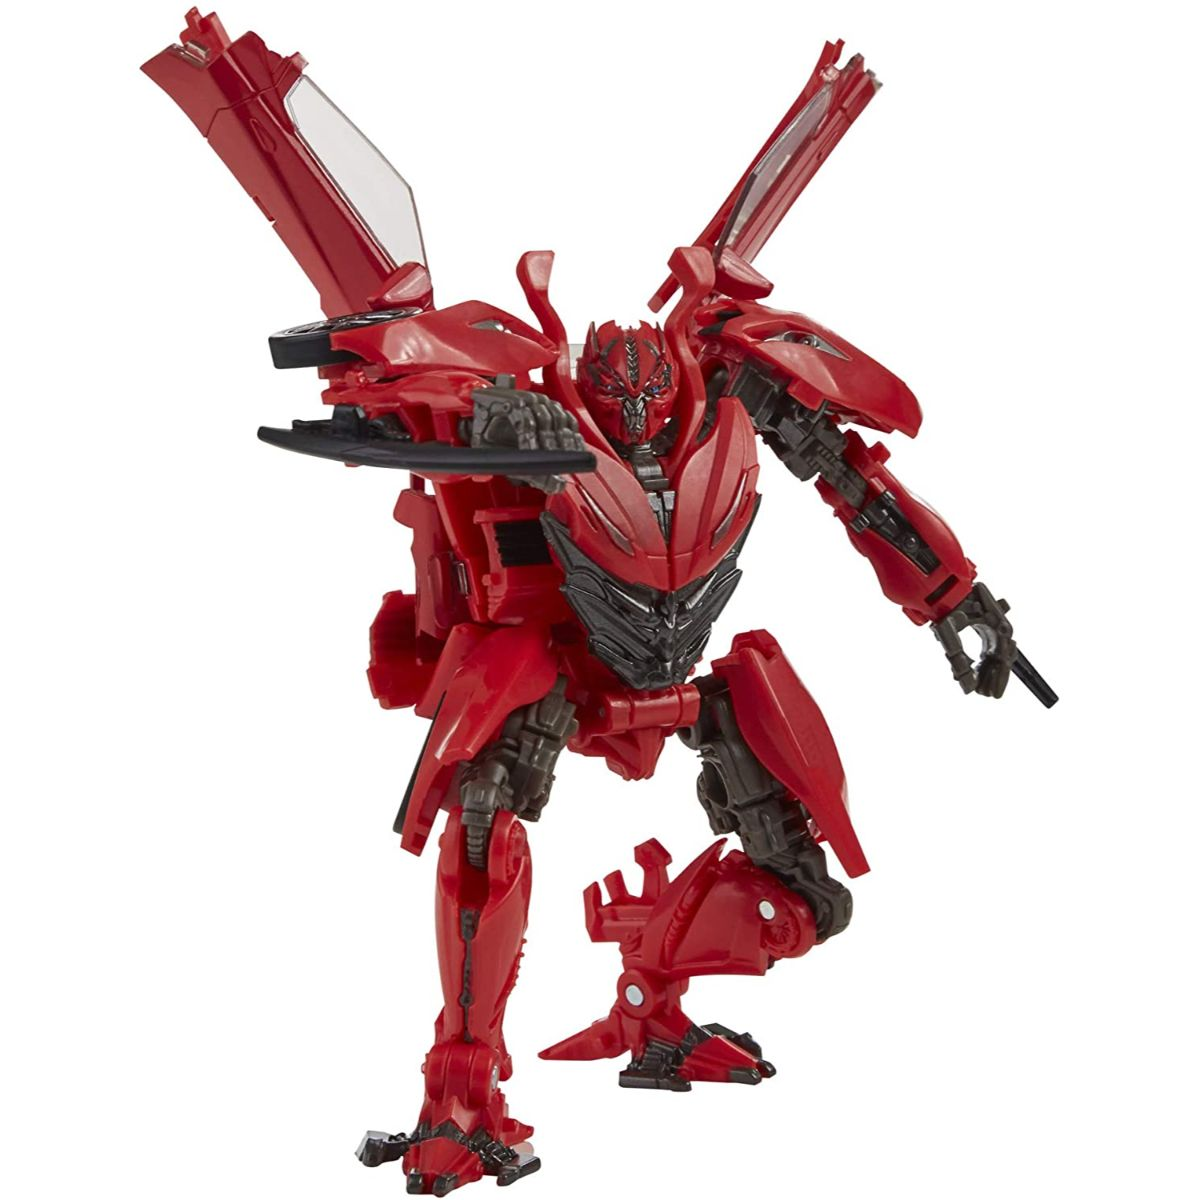 Figurina Transformers Deluxe Studio Series, Autobot Dino, F0785